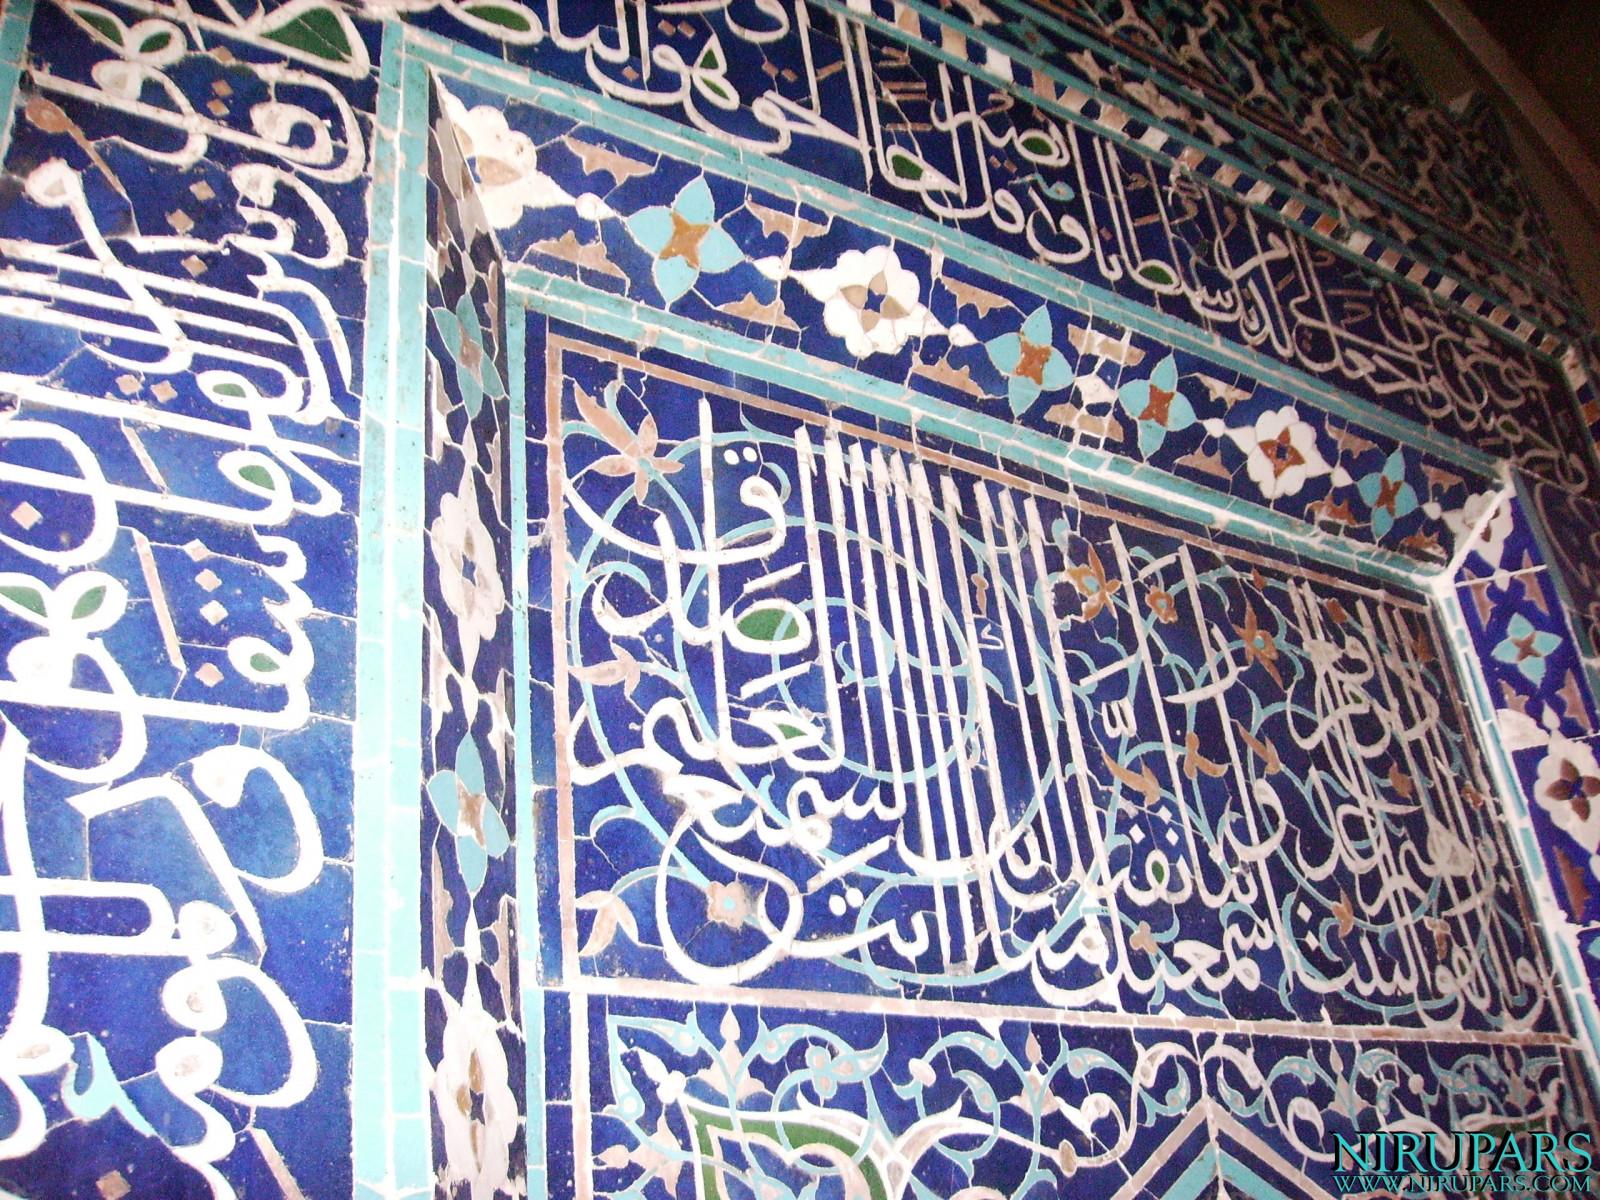 Pars Museum - Painted tiles